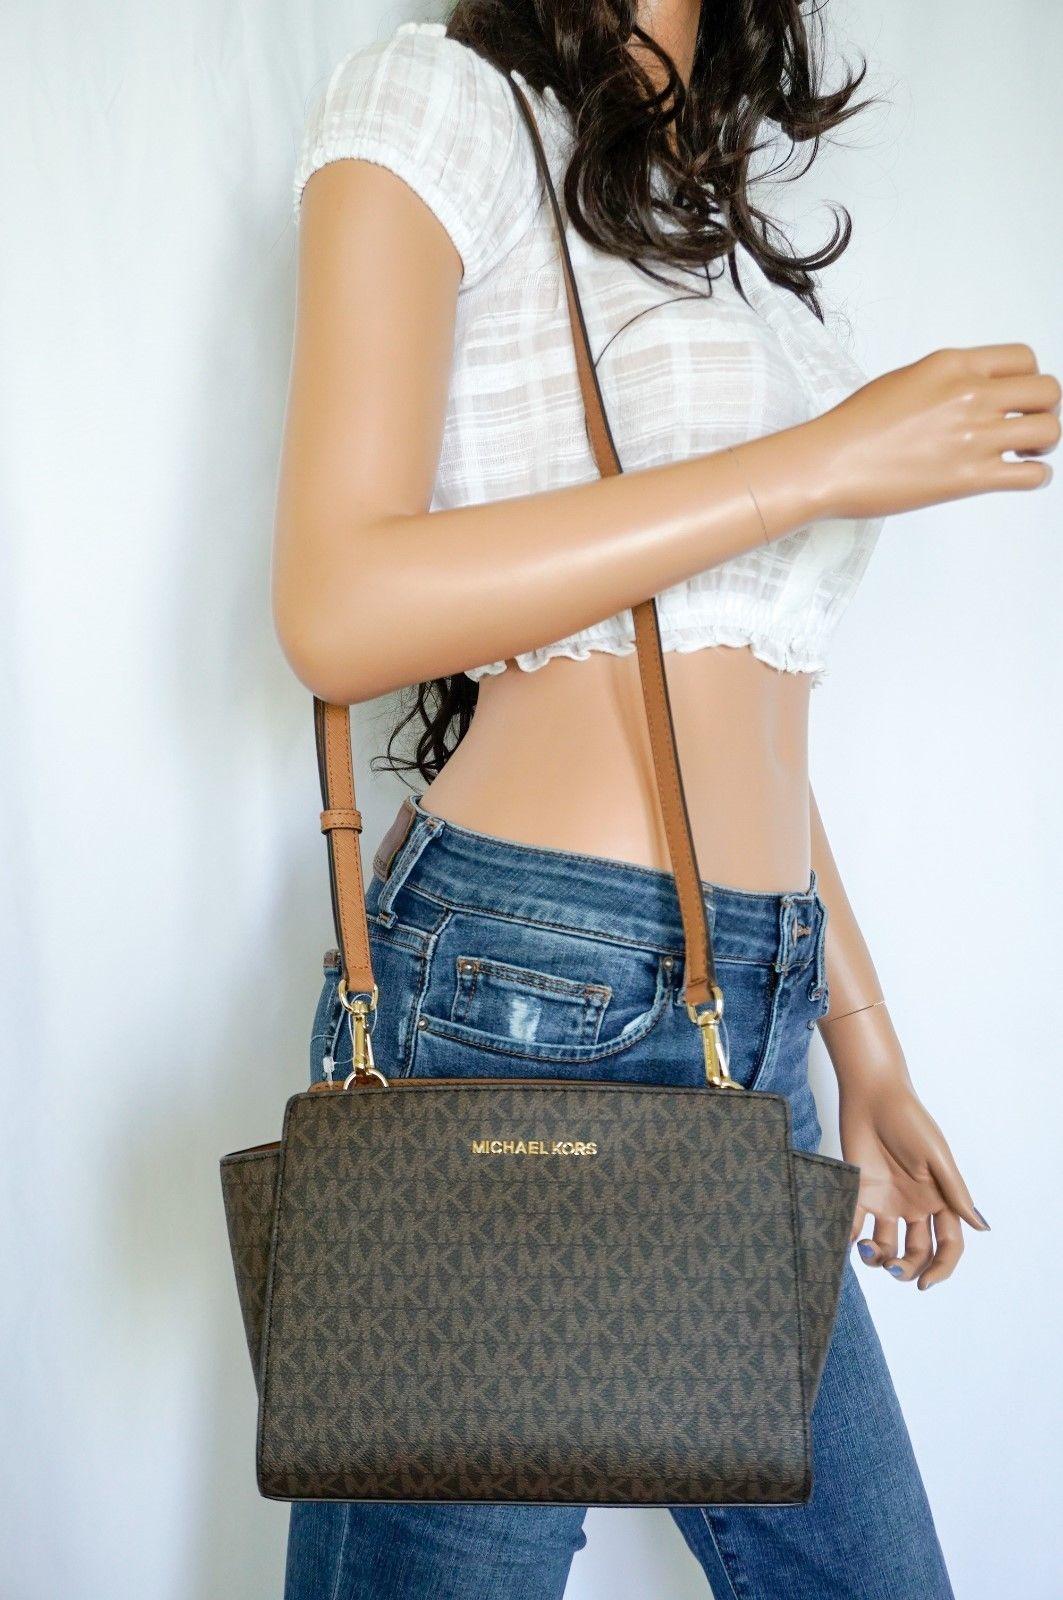 a6301d9368b5c9 Nwt Michael Kors Selma Medium Messenger Bag and 29 similar items. 57